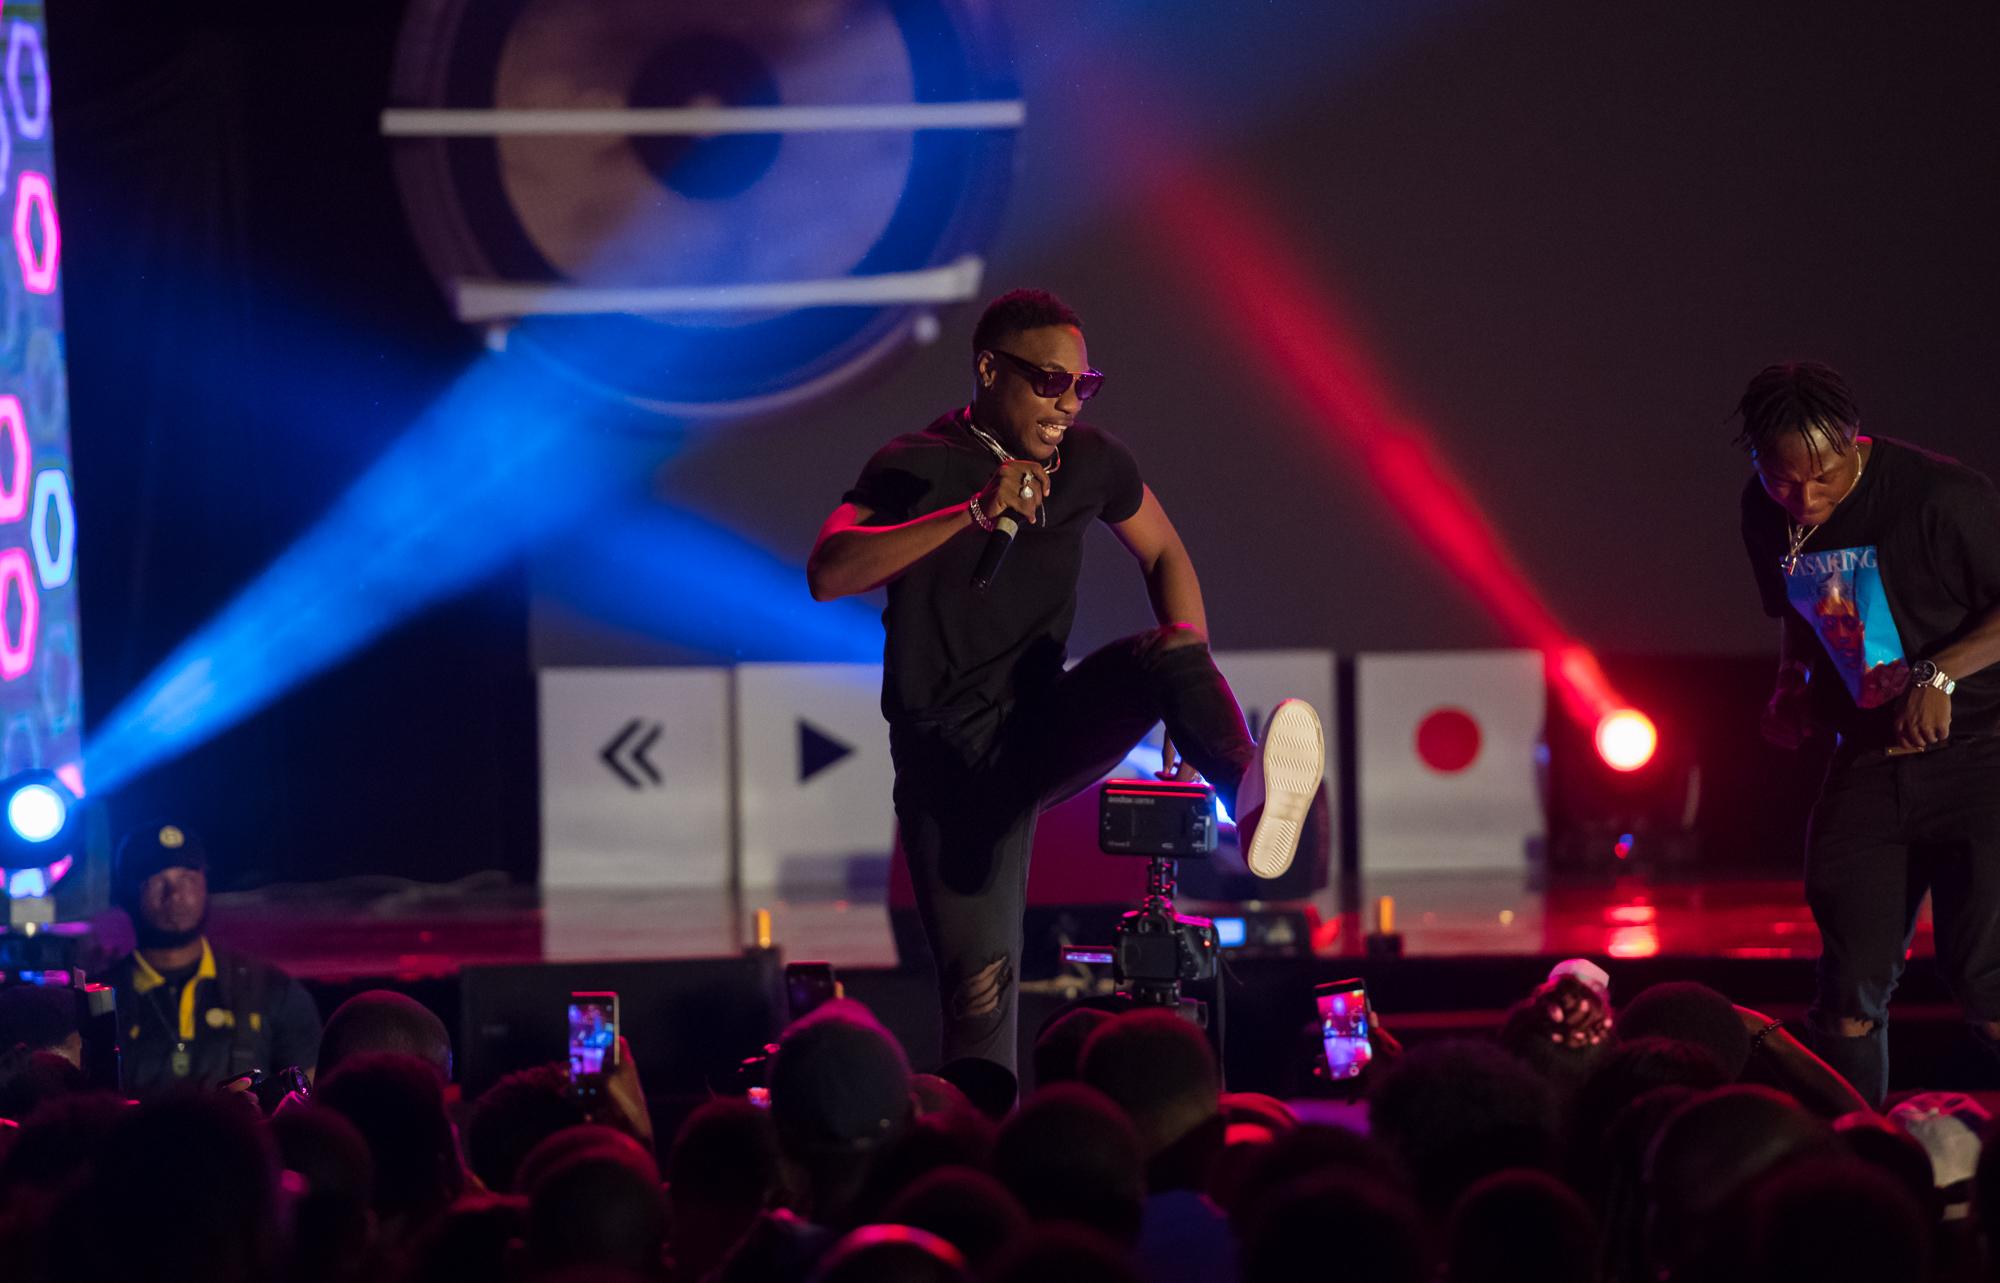 Lagos, Nigeria. 9th November 2018.  L.A.X performing at Human Radio Concert. Photographed by Michael Tubes